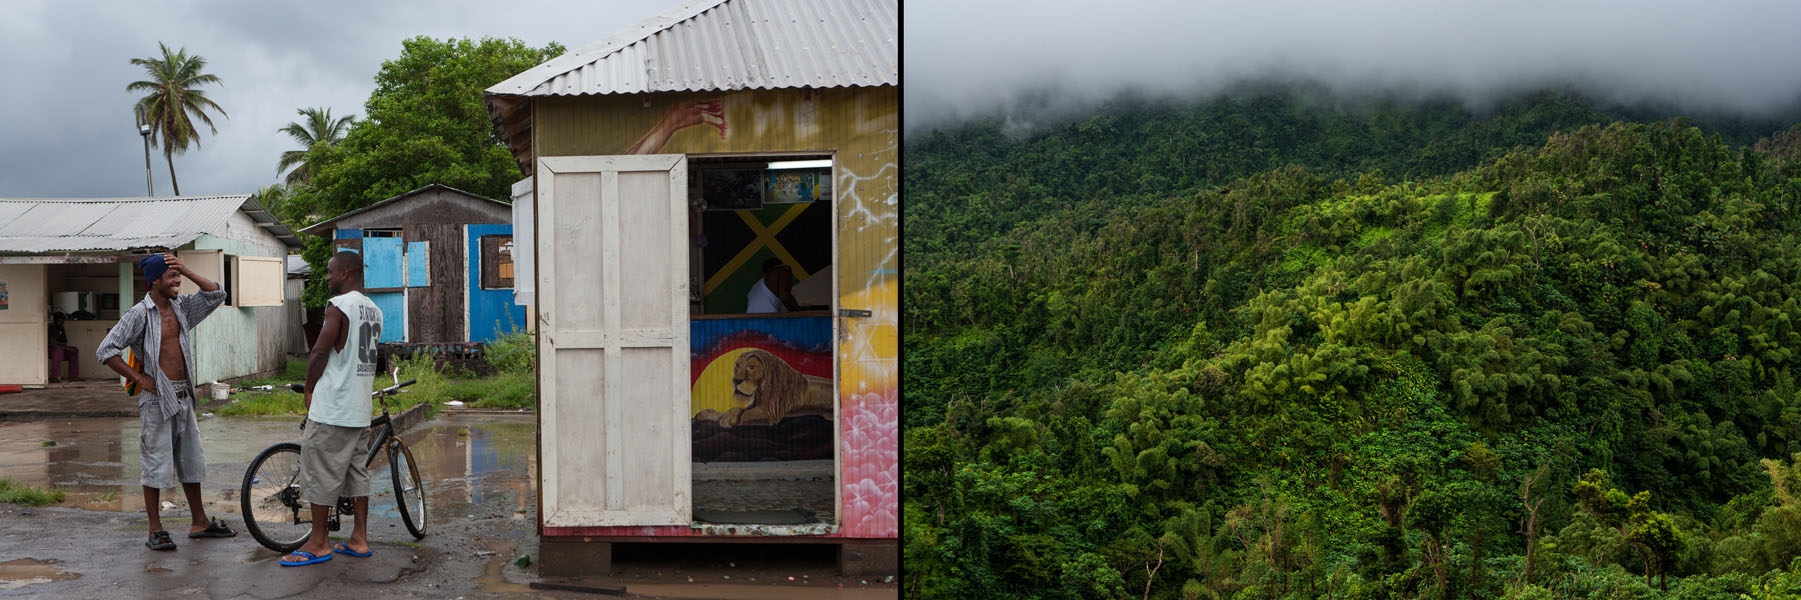 Grenada_2D